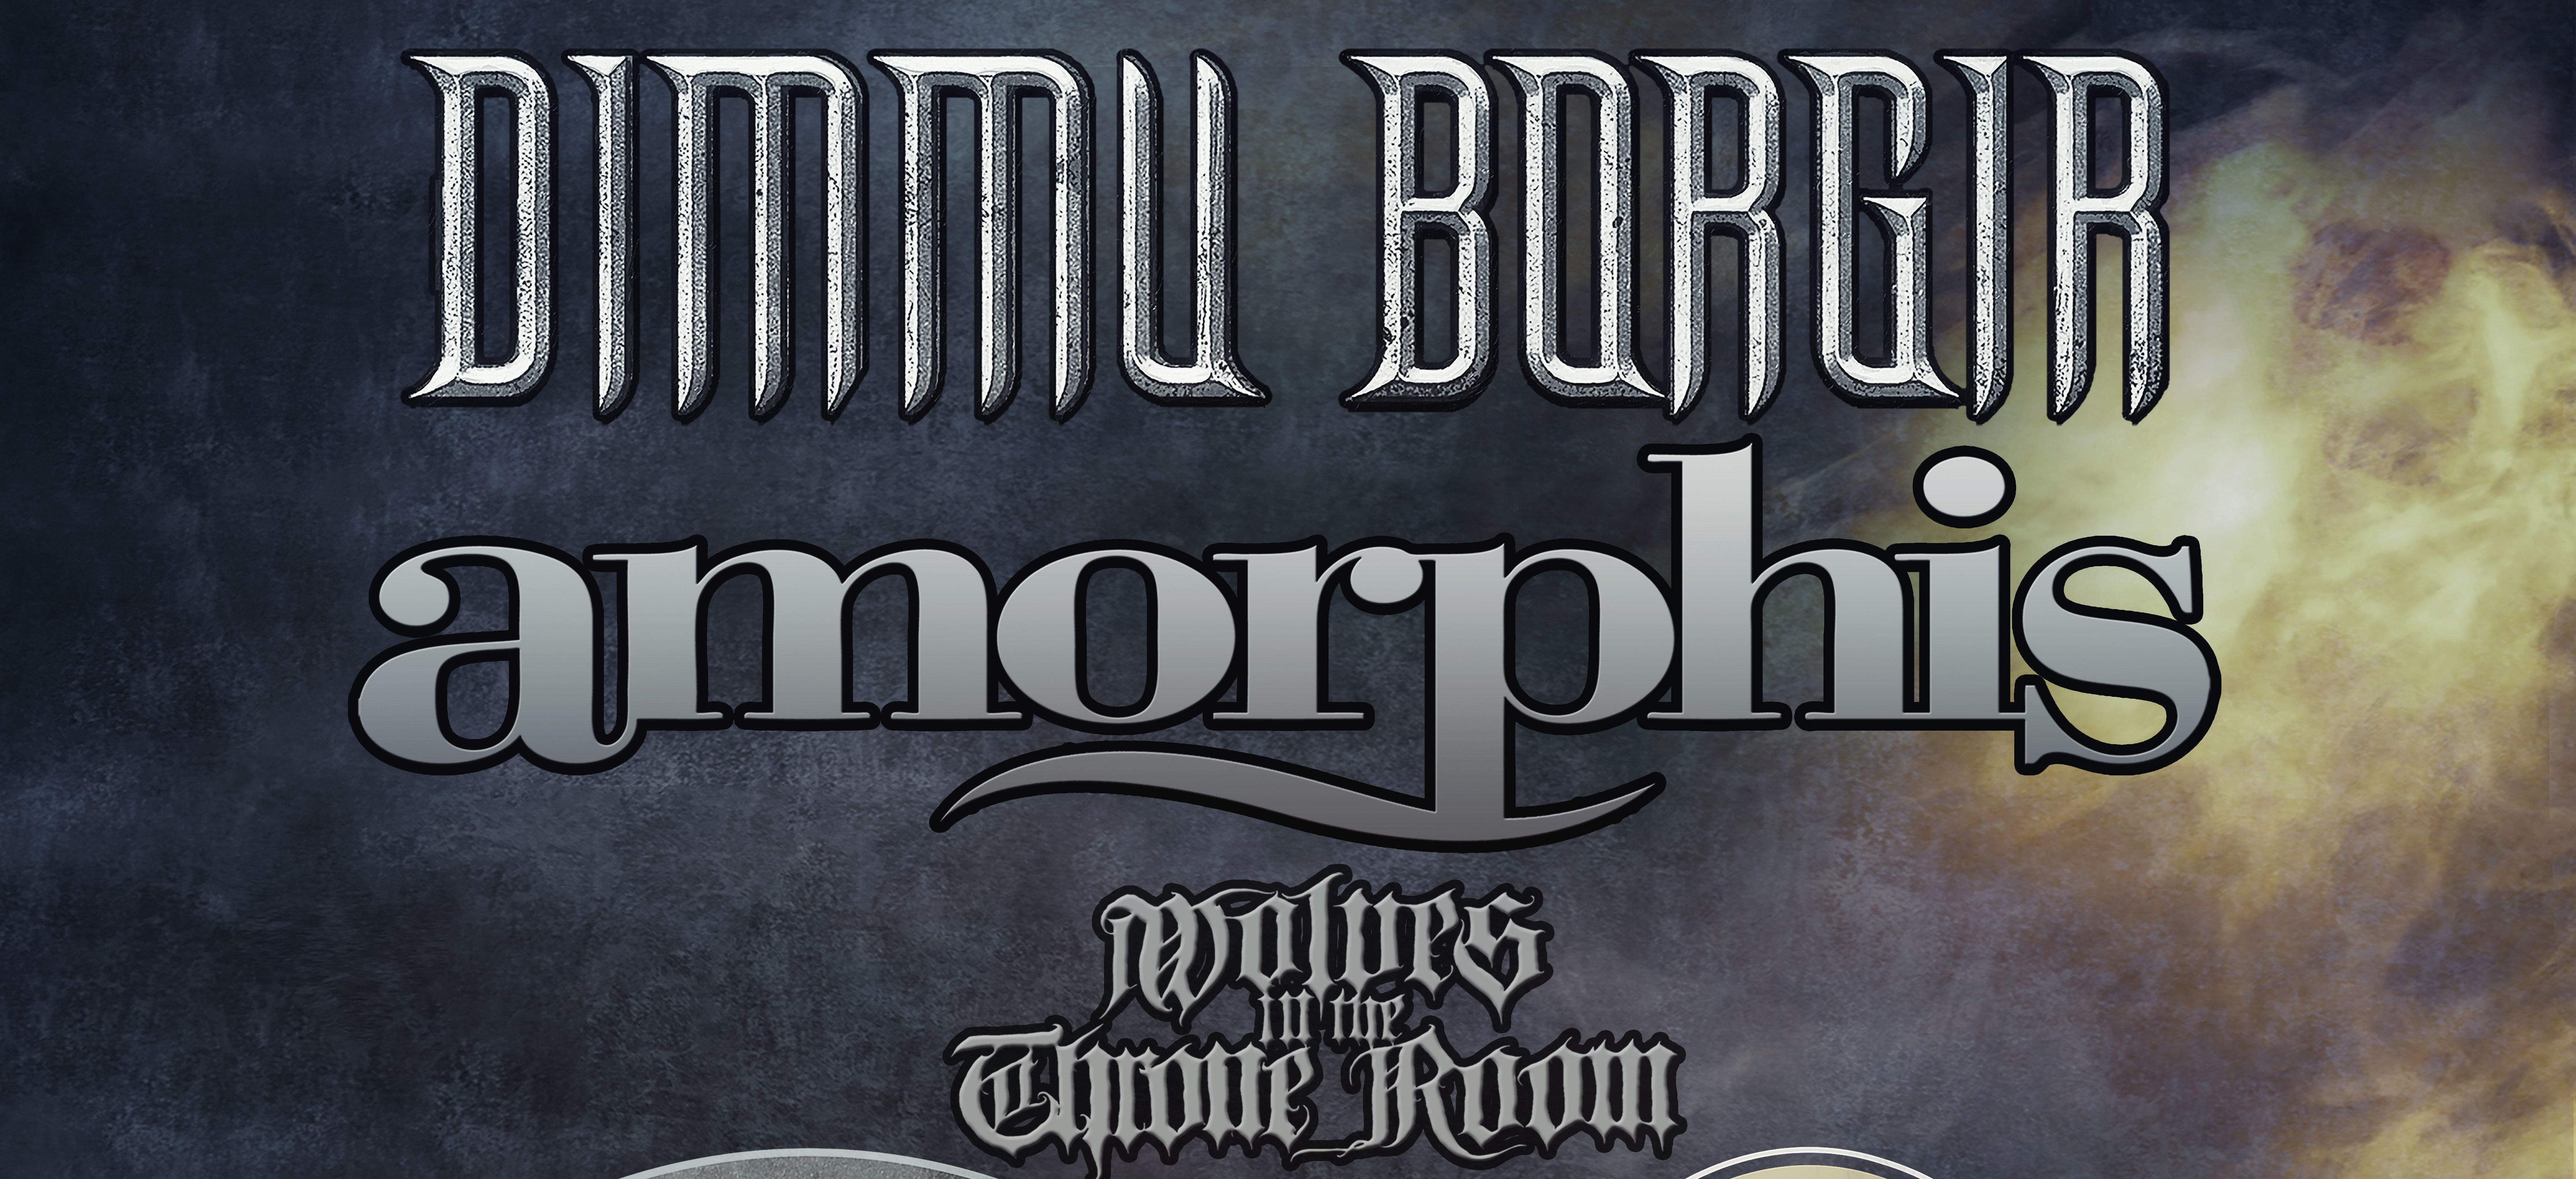 DimmuBorgir_Amorphis_Tour2020_MoshpitPassion